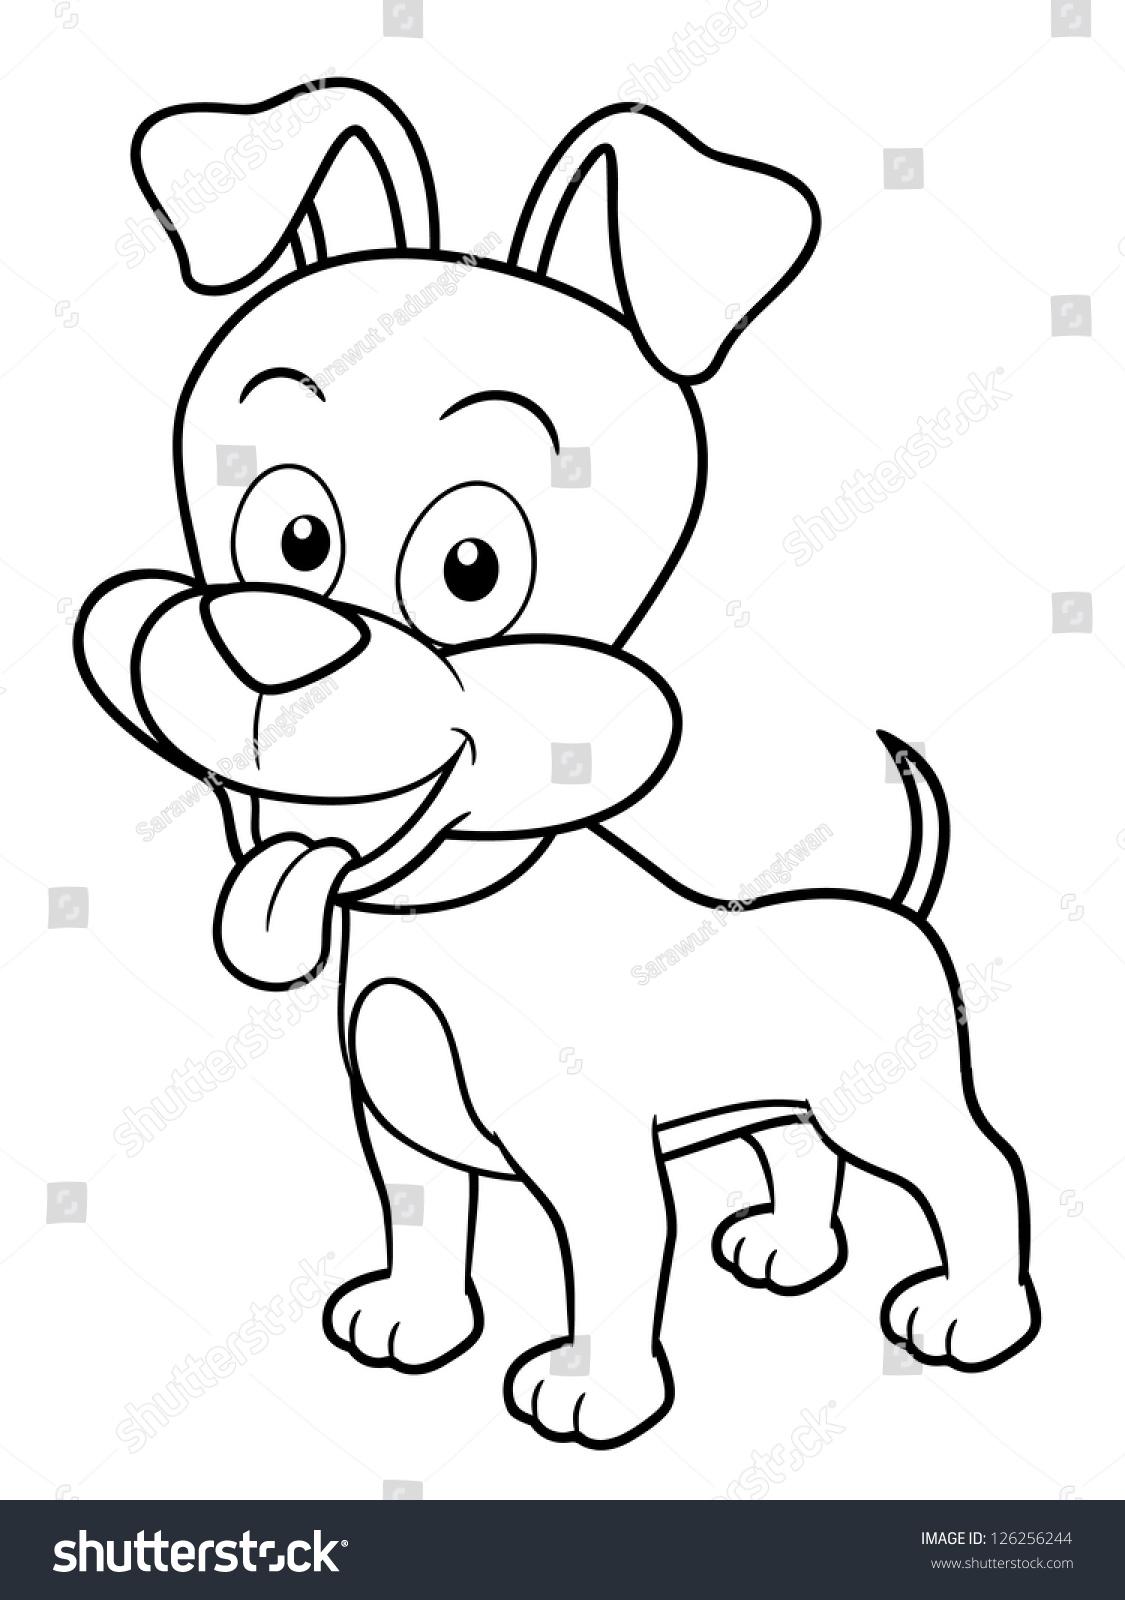 illustration of cartoon dog coloring book